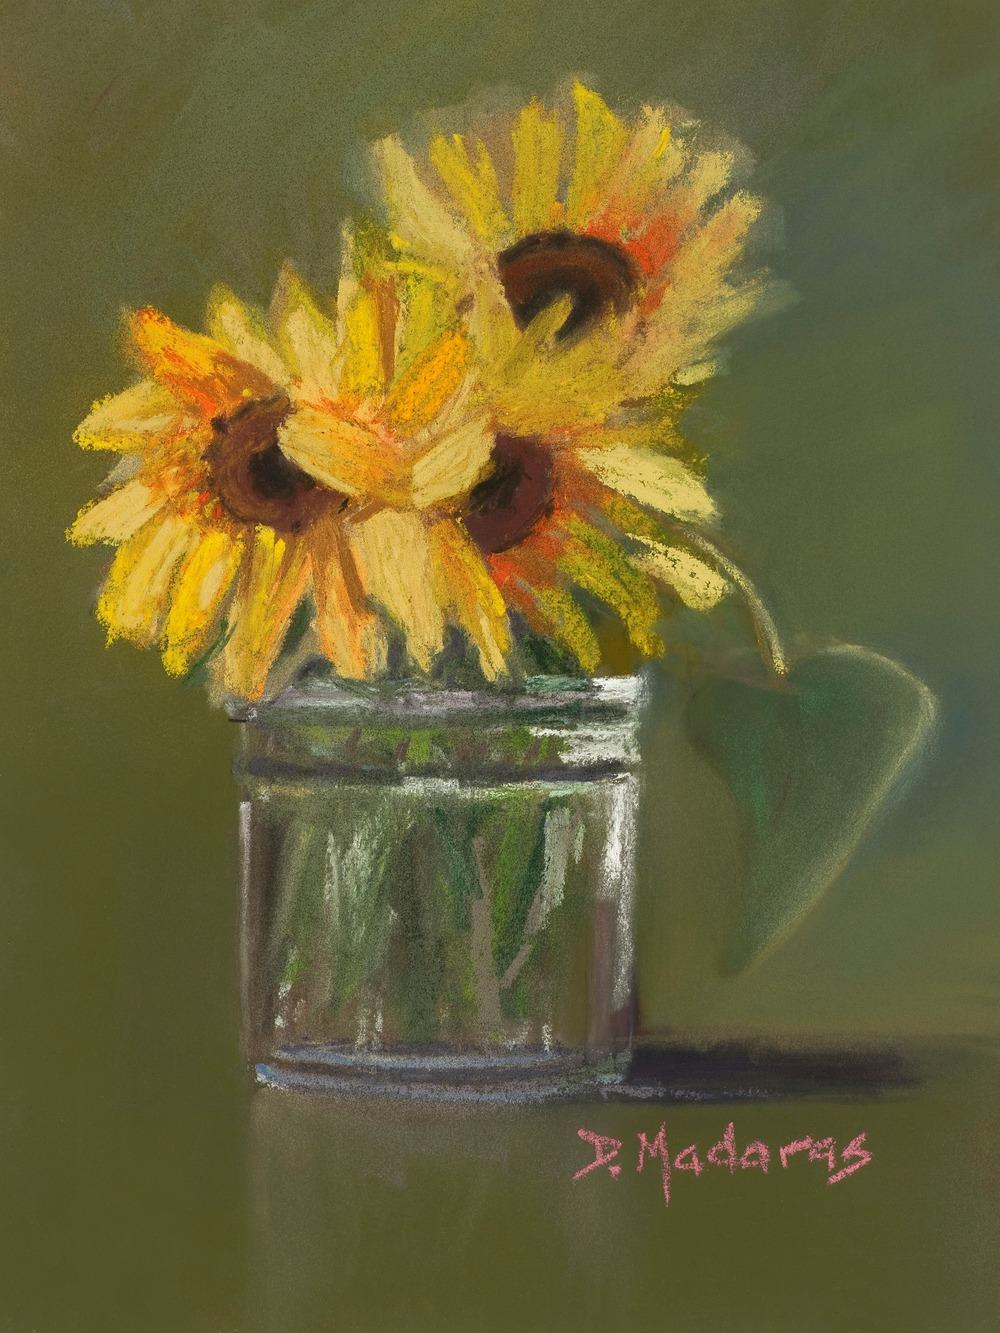 Safeway Sunflowers by Diana Madaras